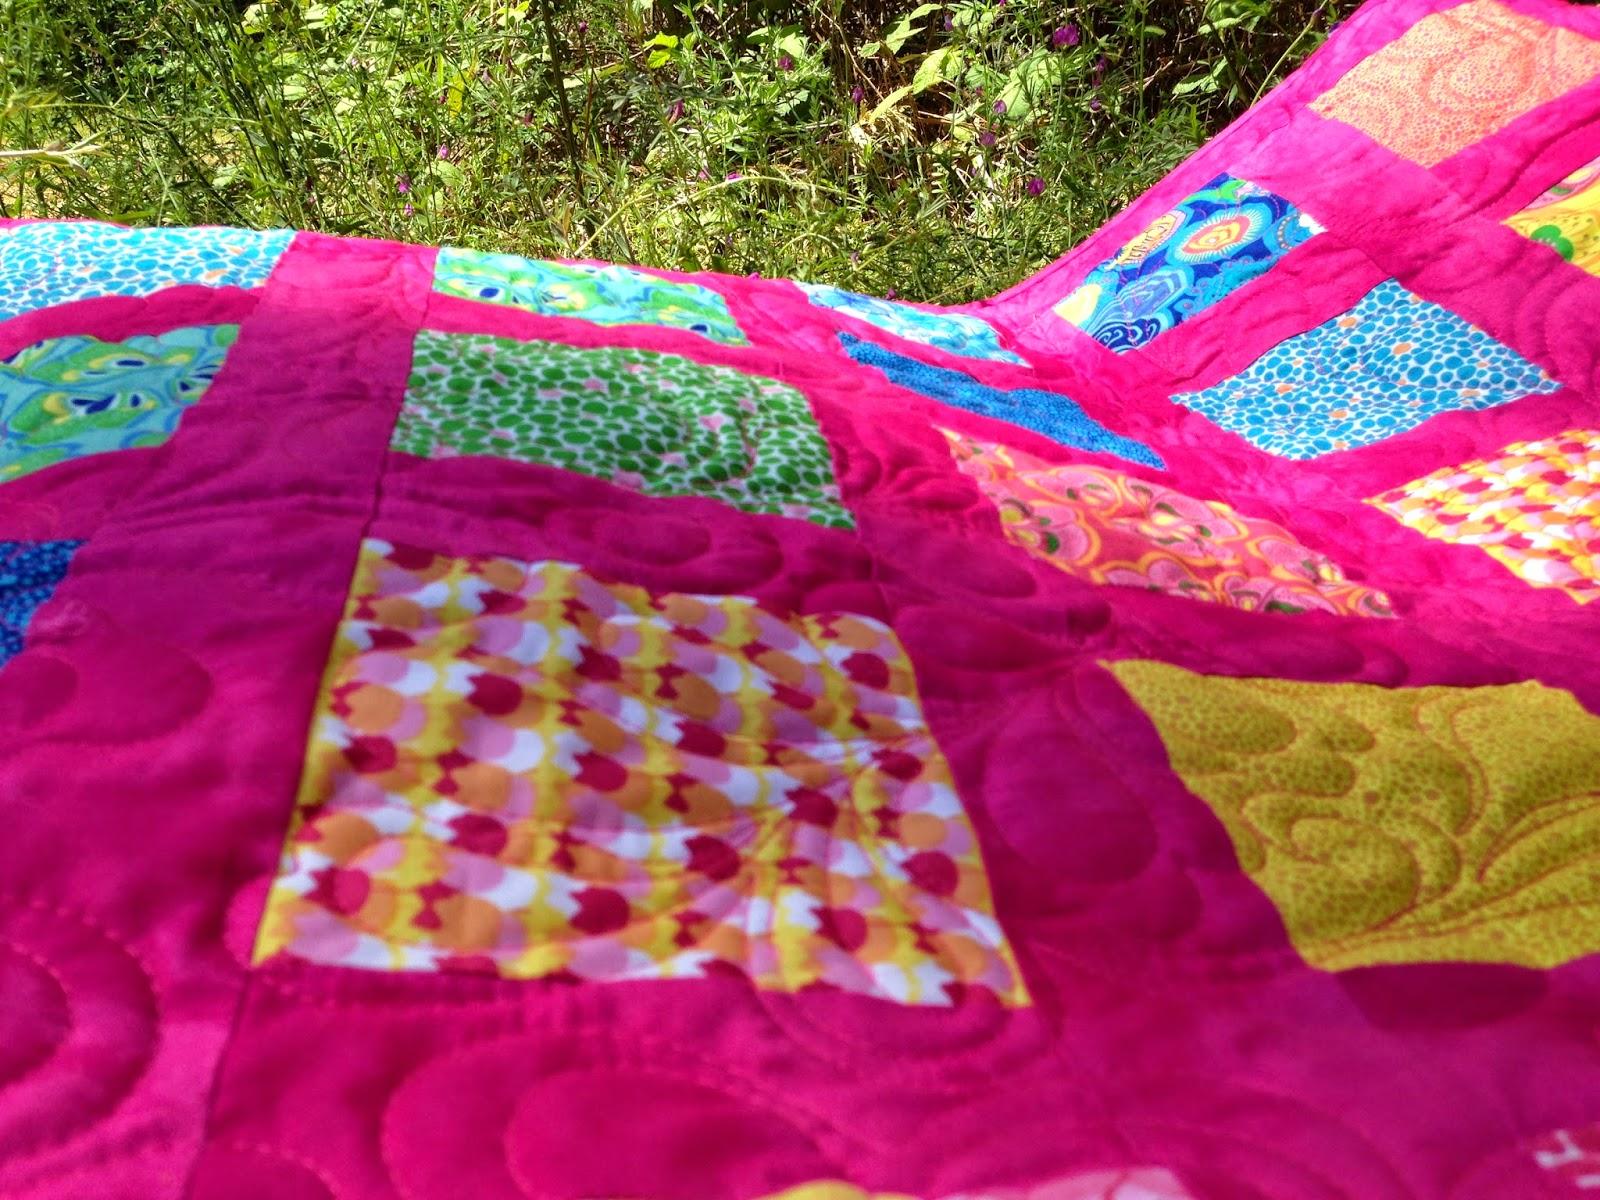 Jessica Darling, Bella Caronia, Windham Fabrics, Quilts, Spring Bloom Fabric